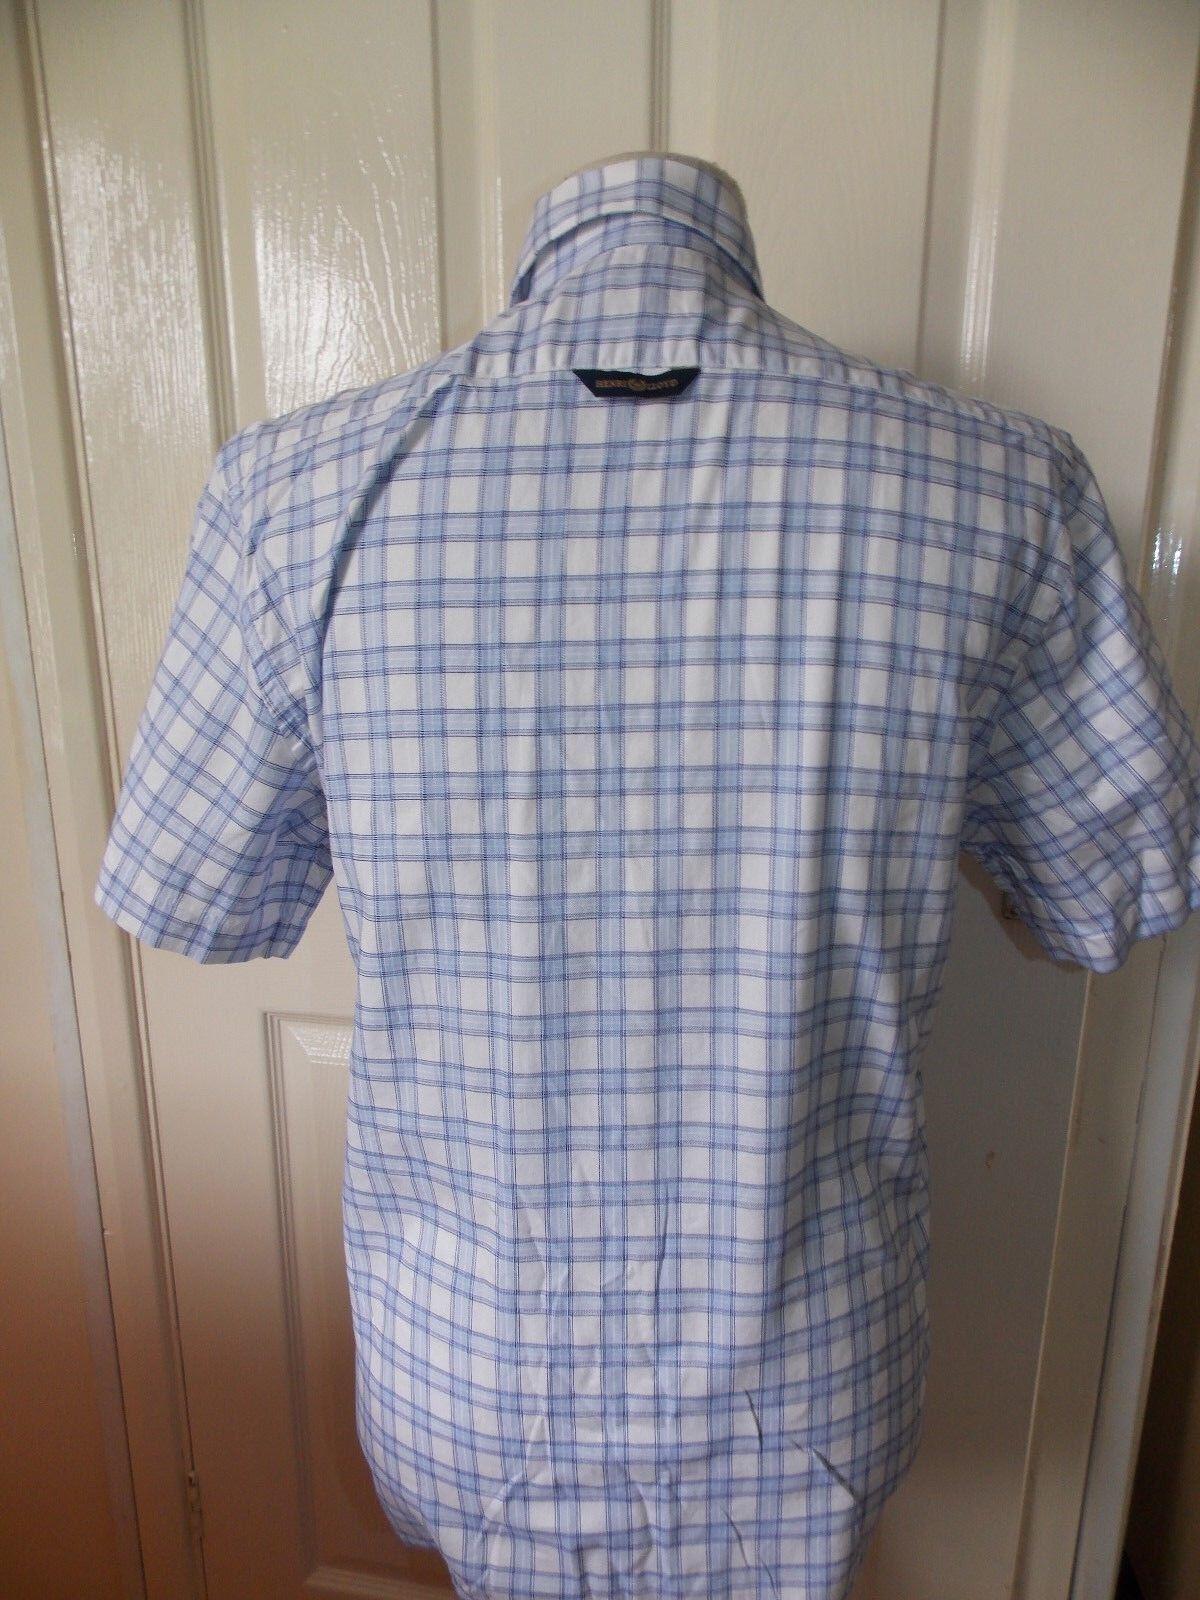 Superbe nouvelle chemise Homme Homme Homme Henri Lloyd Chemise RRP £ 64.99 Royaume-Uni Petit homme 452cd7